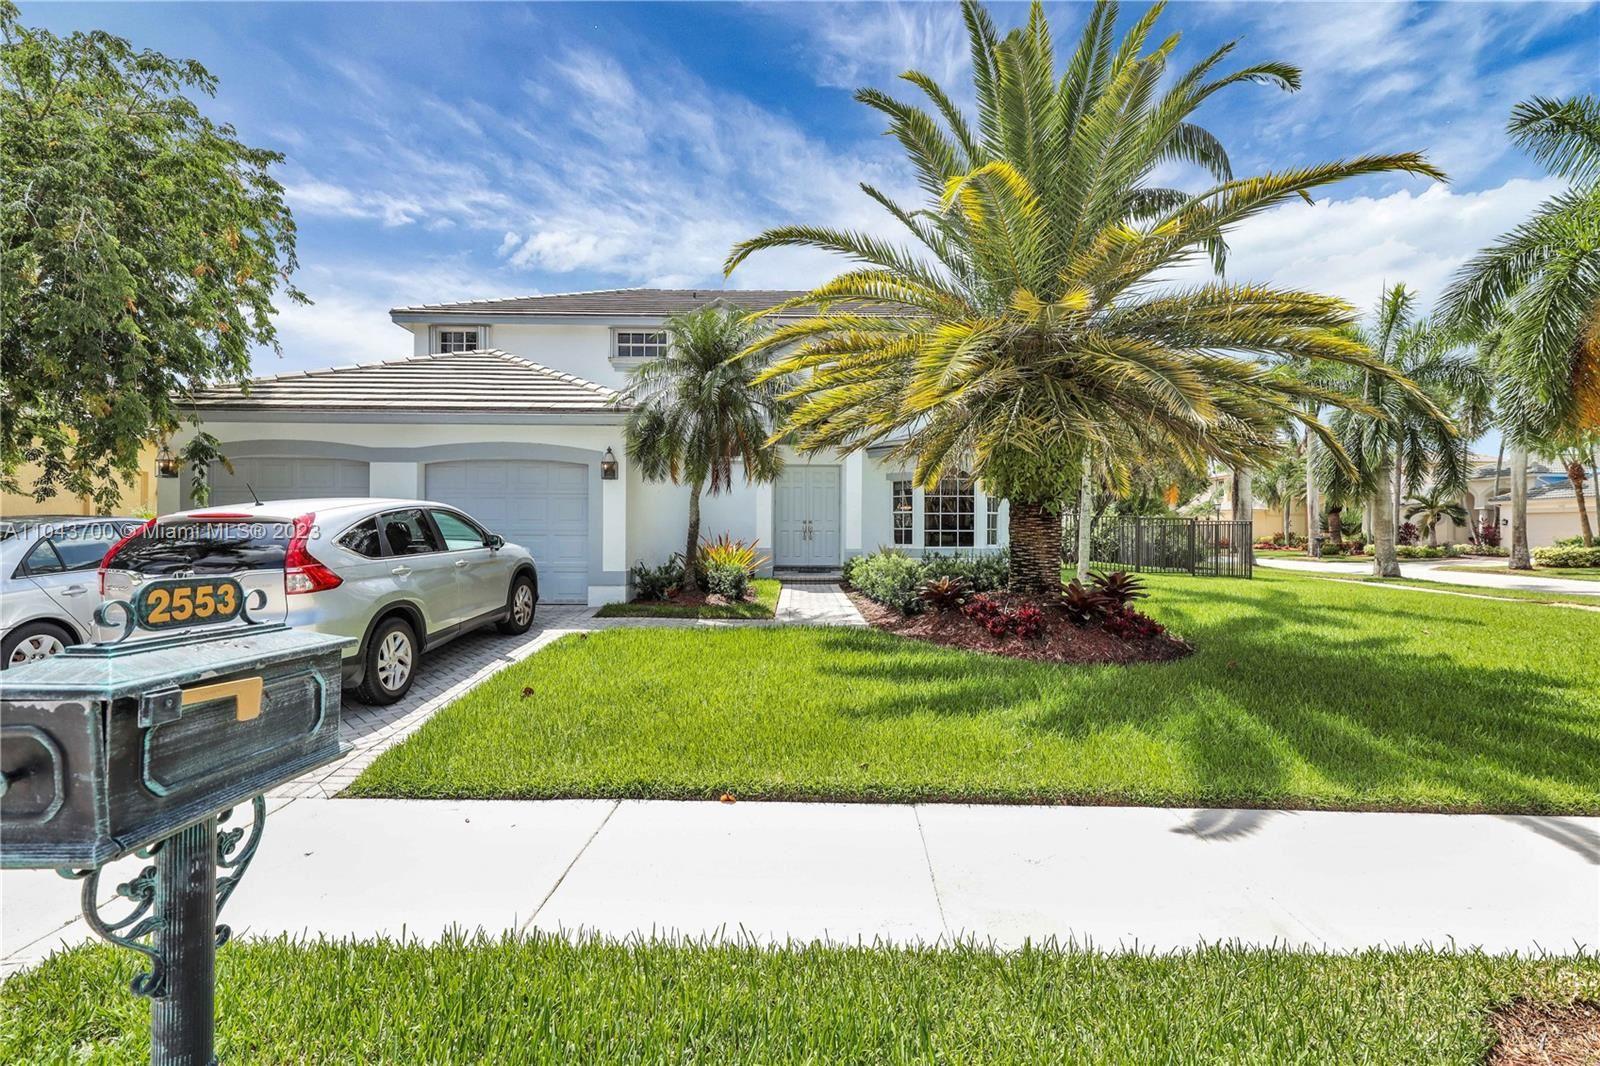 2553 Jardin Ter, Weston, FL 33327 - #: A11043700